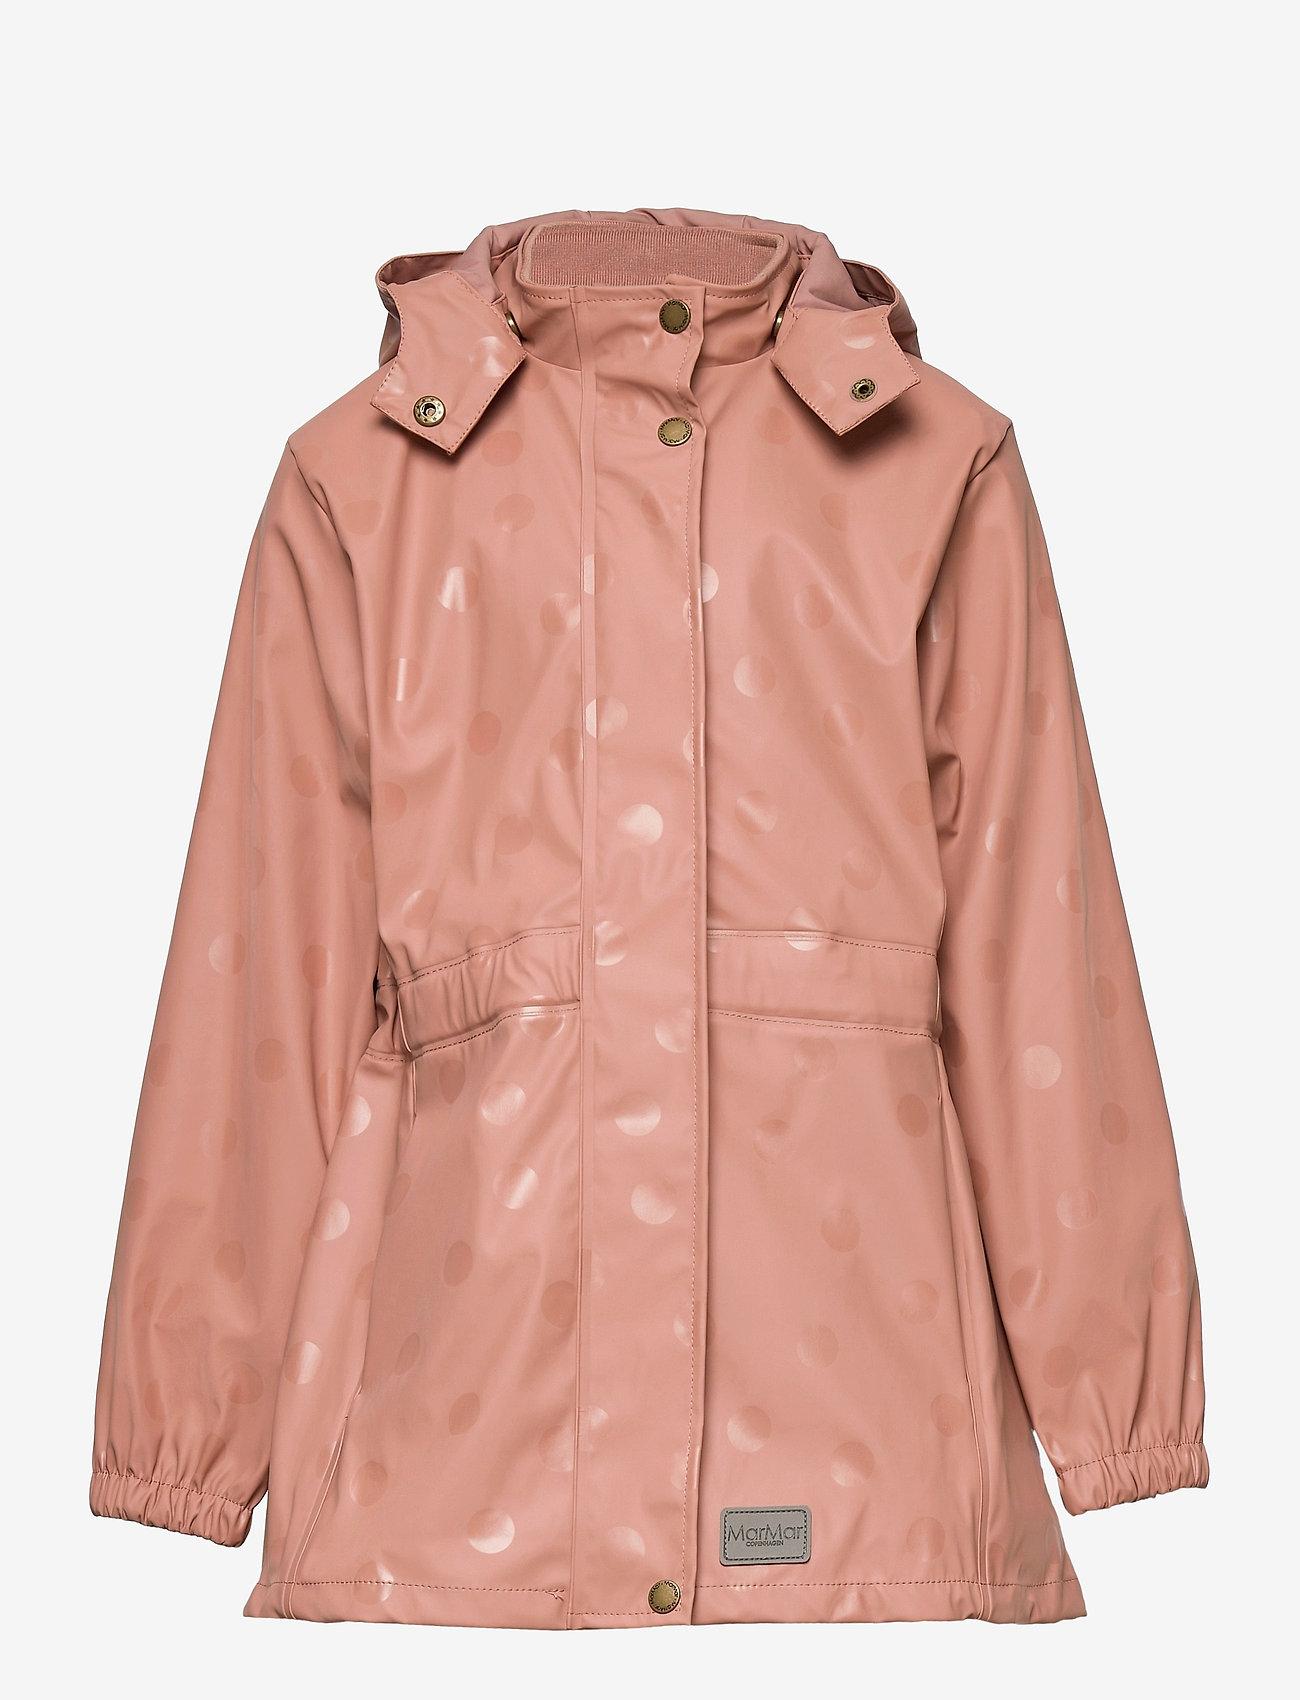 MarMar Cph - Rainwear Set Oceana - ensembles - rose brown dot - 1